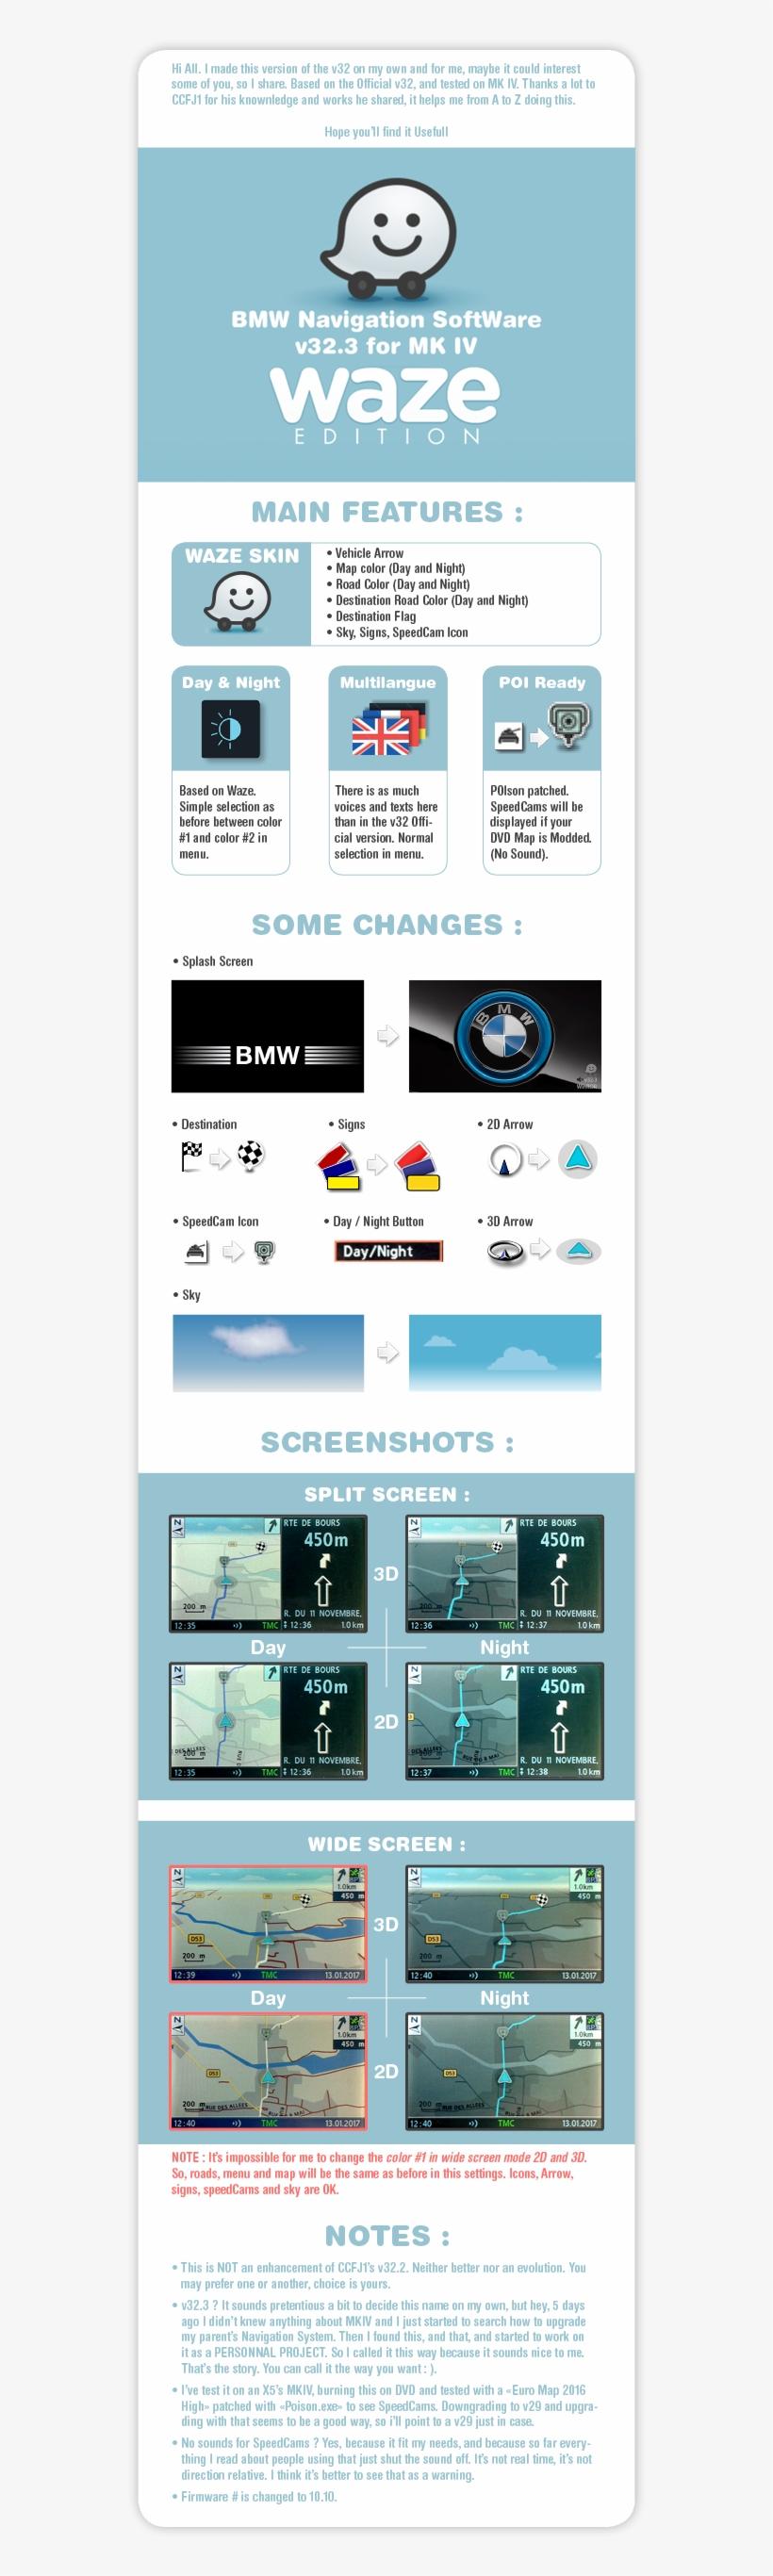 Waze - Free Transparent PNG Download - PNGkey